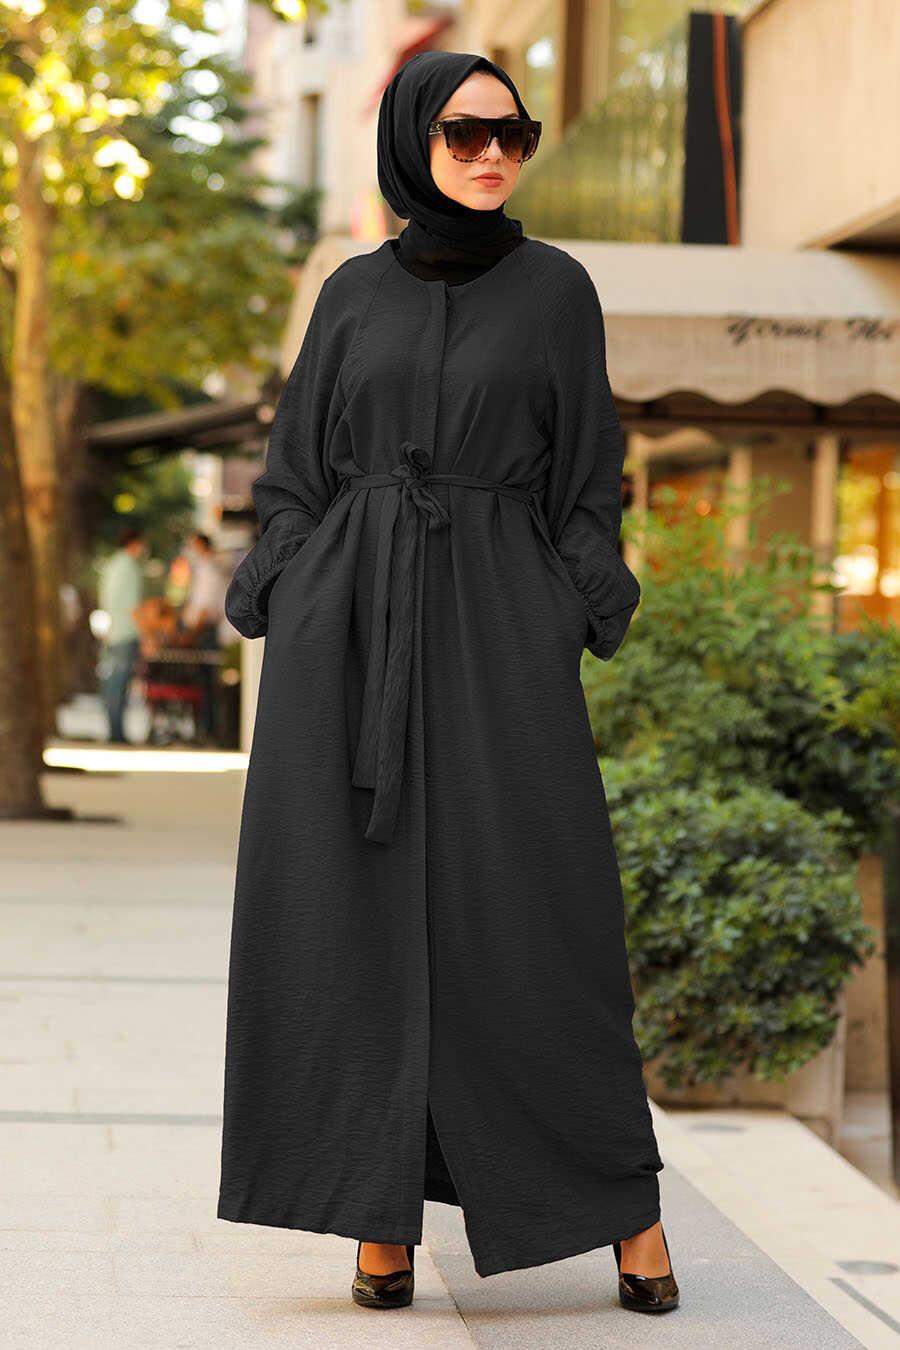 Black Hijab Turkish Abaya 40921S